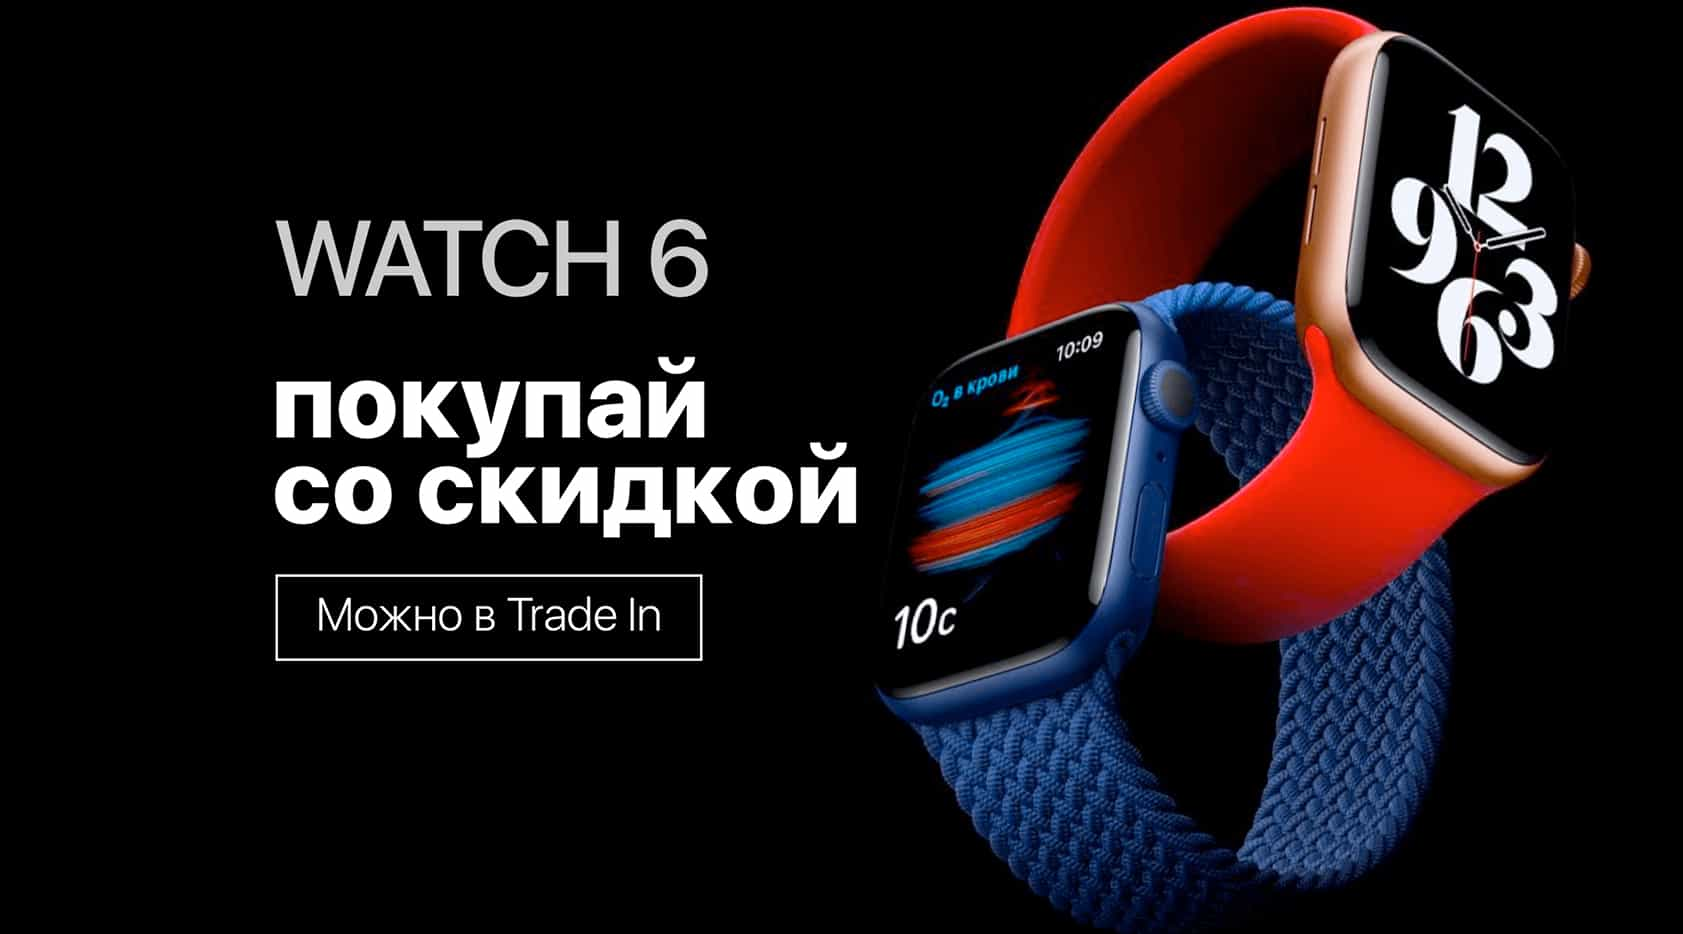 Apple Watch Series 6 – уже в продаже